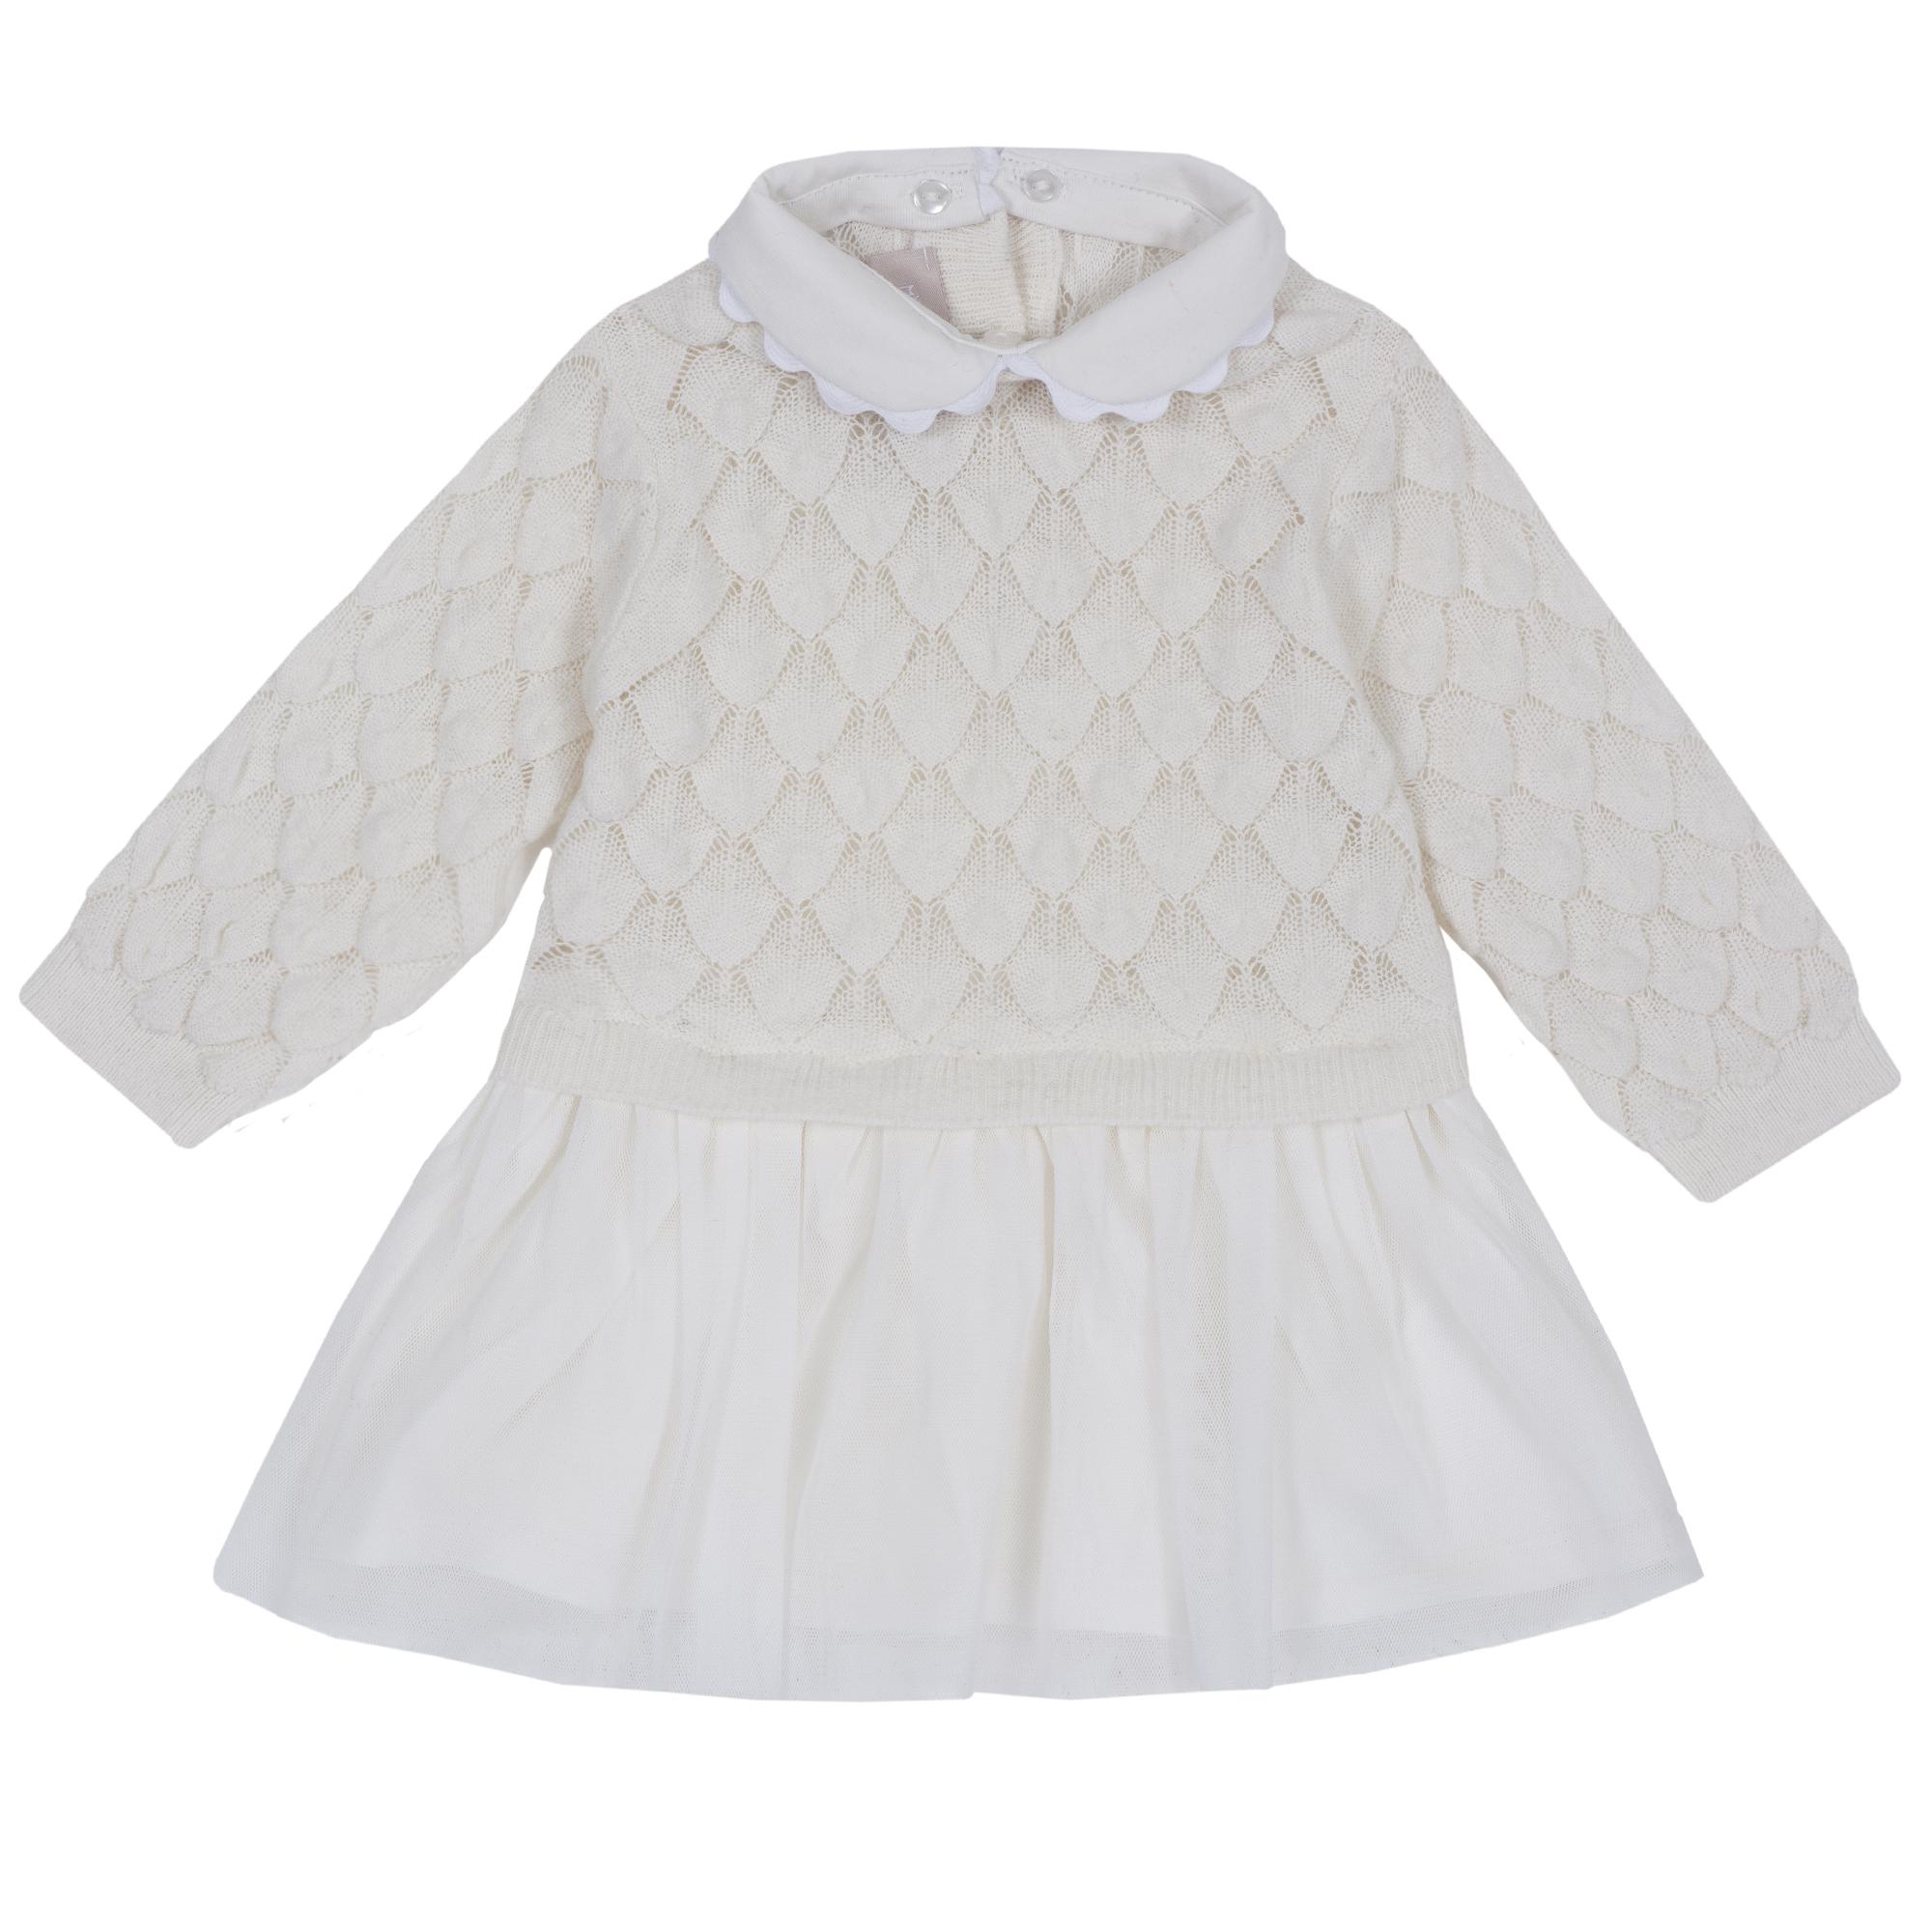 Rochie eleganta copii Chicco, dantela tricotata, alb, 03505 din categoria Rochii, Fuste